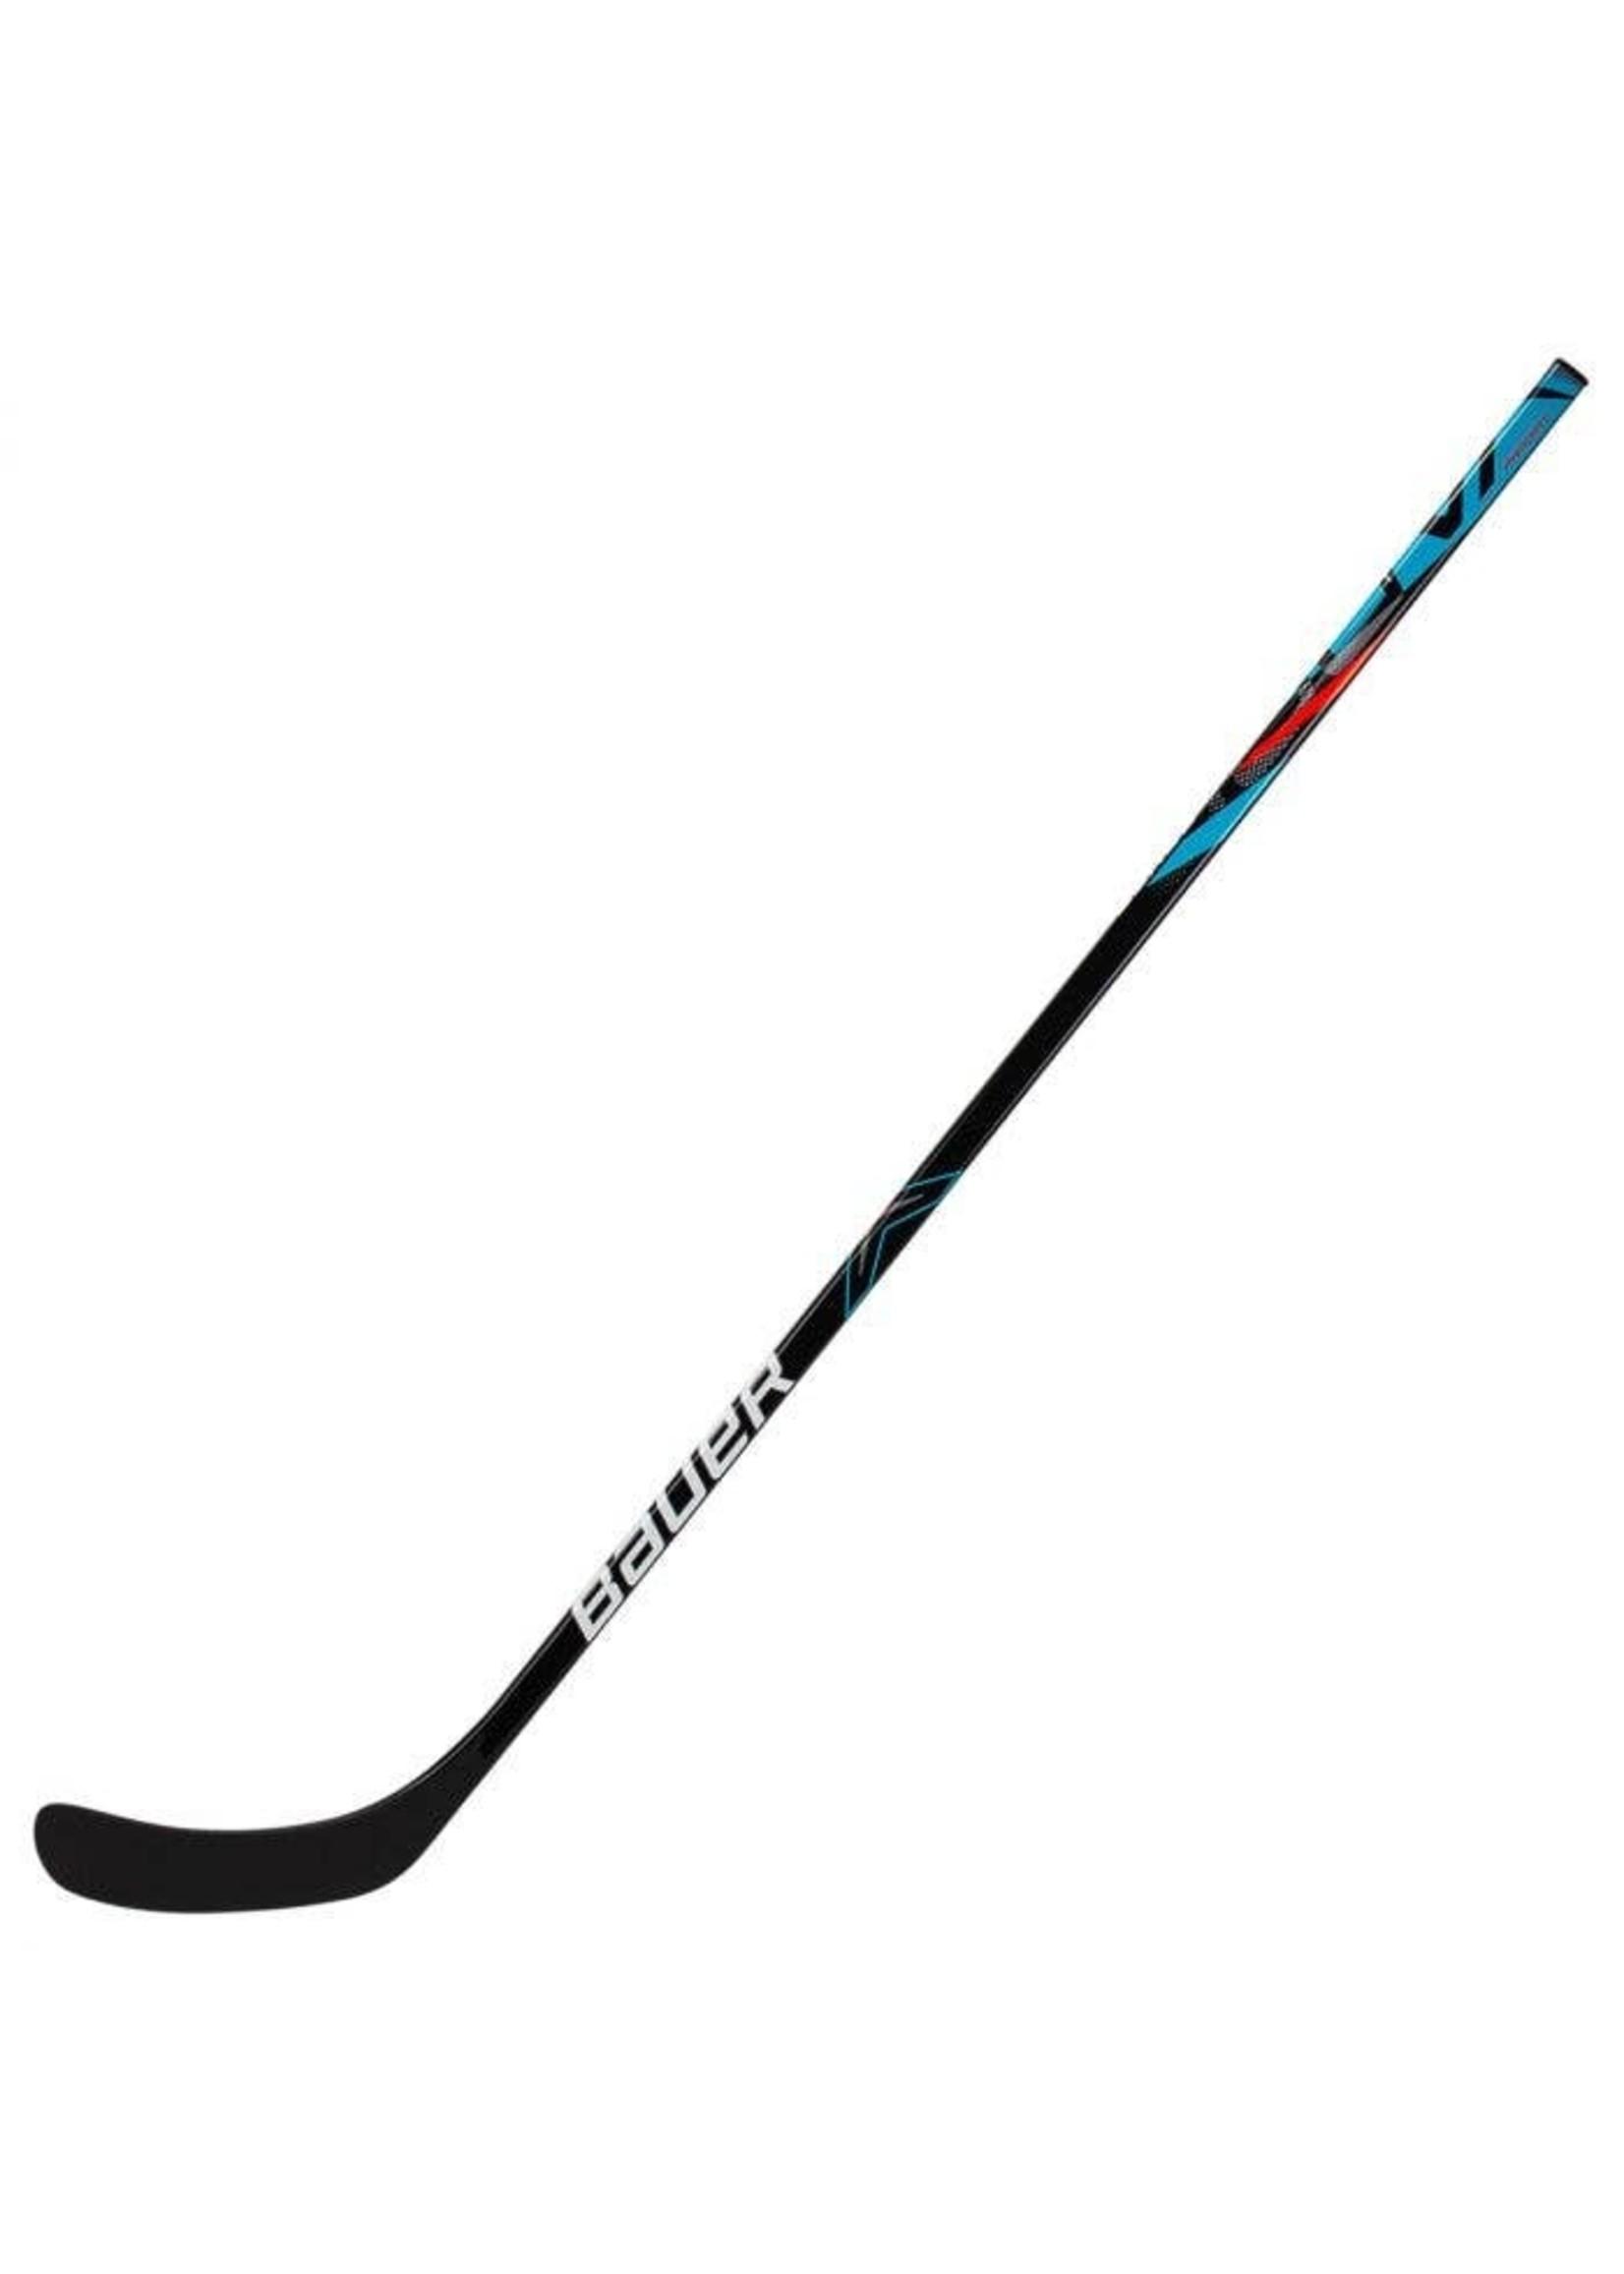 Bauer Hockey BAUER S19 VAPOR PRODIGY 40 FLEX JR STICK